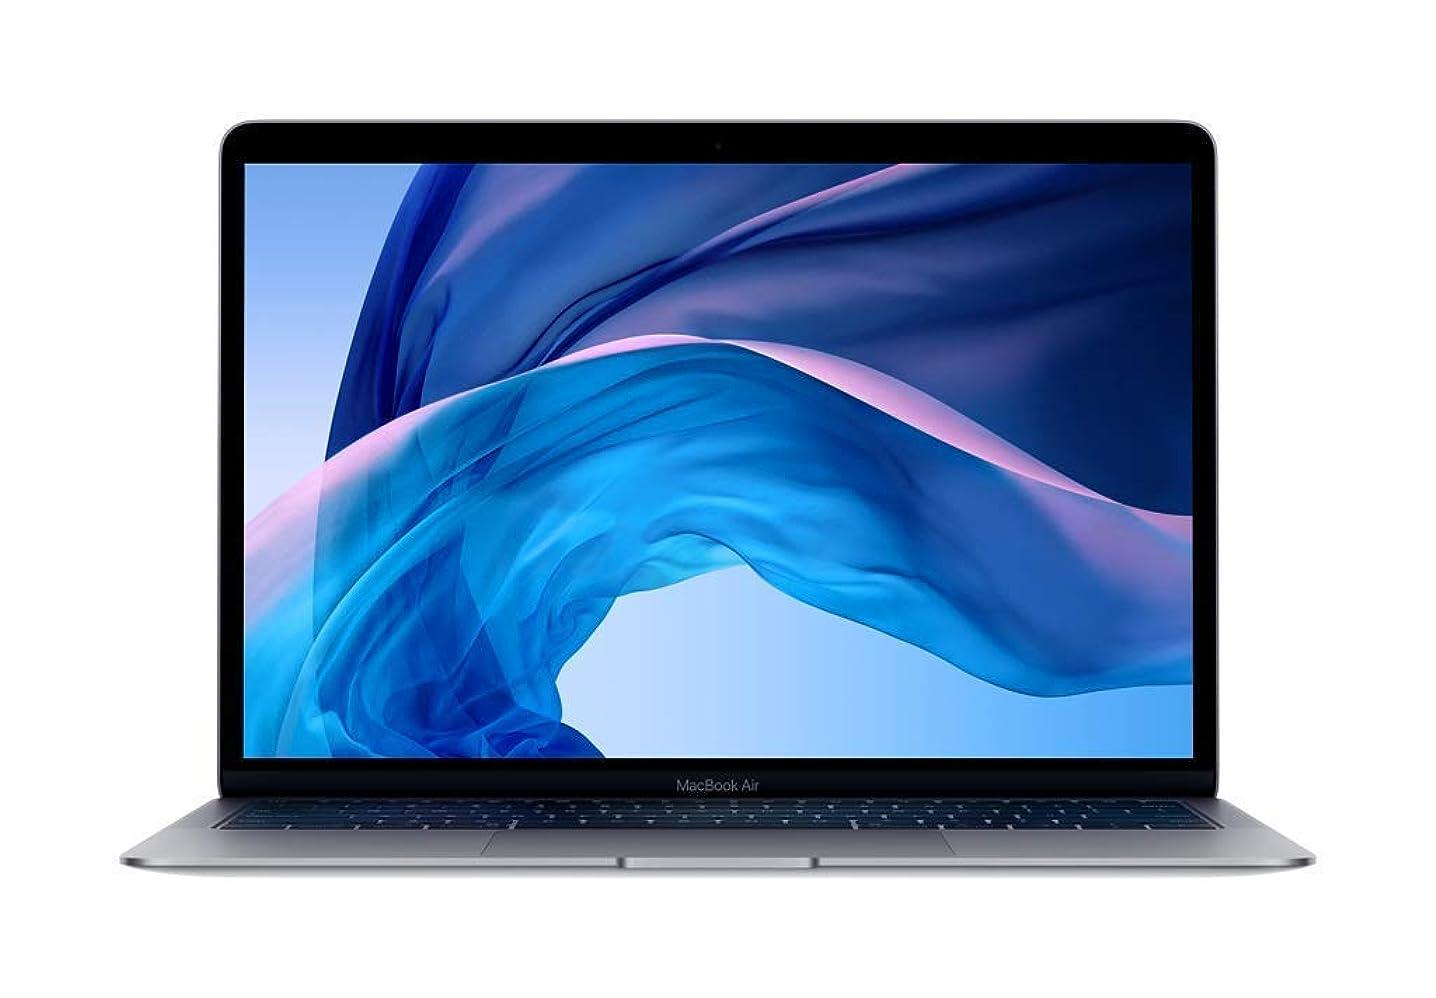 Apple MacBook Air (13-inch Retina display, 1.6GHz dual-core Intel Core i5, 128GB) - Space Gray (Latest Model) (Renewed)